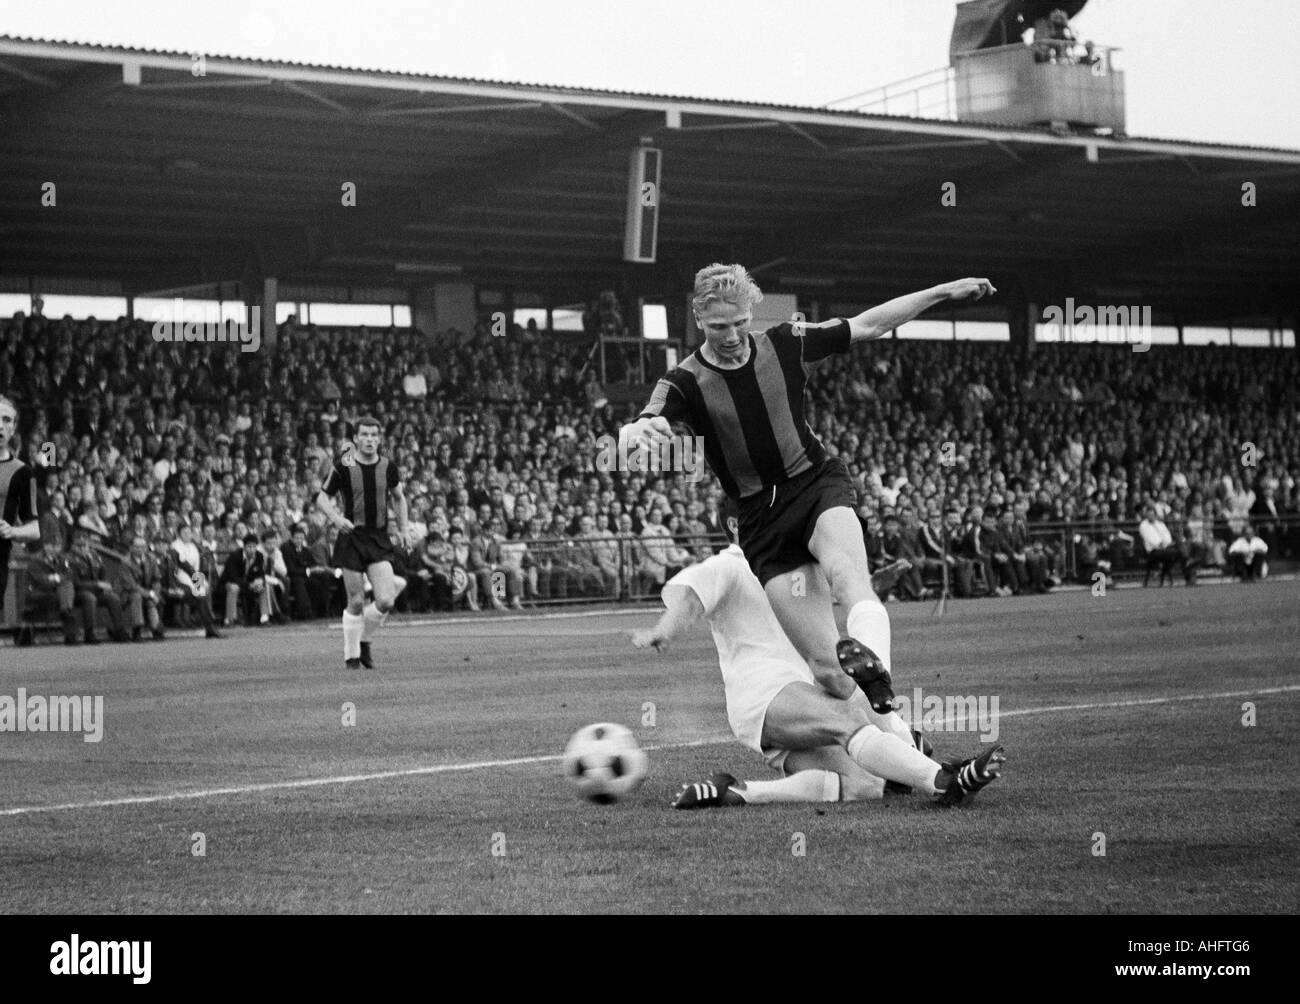 football, Regionalliga 1967/1968, promotion match to the Bundesliga 1968/1969, Bayer Leverkusen versus TuS Neuendorf 1:1, Ulrich Haberland Stadium in Leverkusen, scene of the match, duel between Manfred Taubenmann (Neuendorf) right and a Leverkusen player - Stock Image